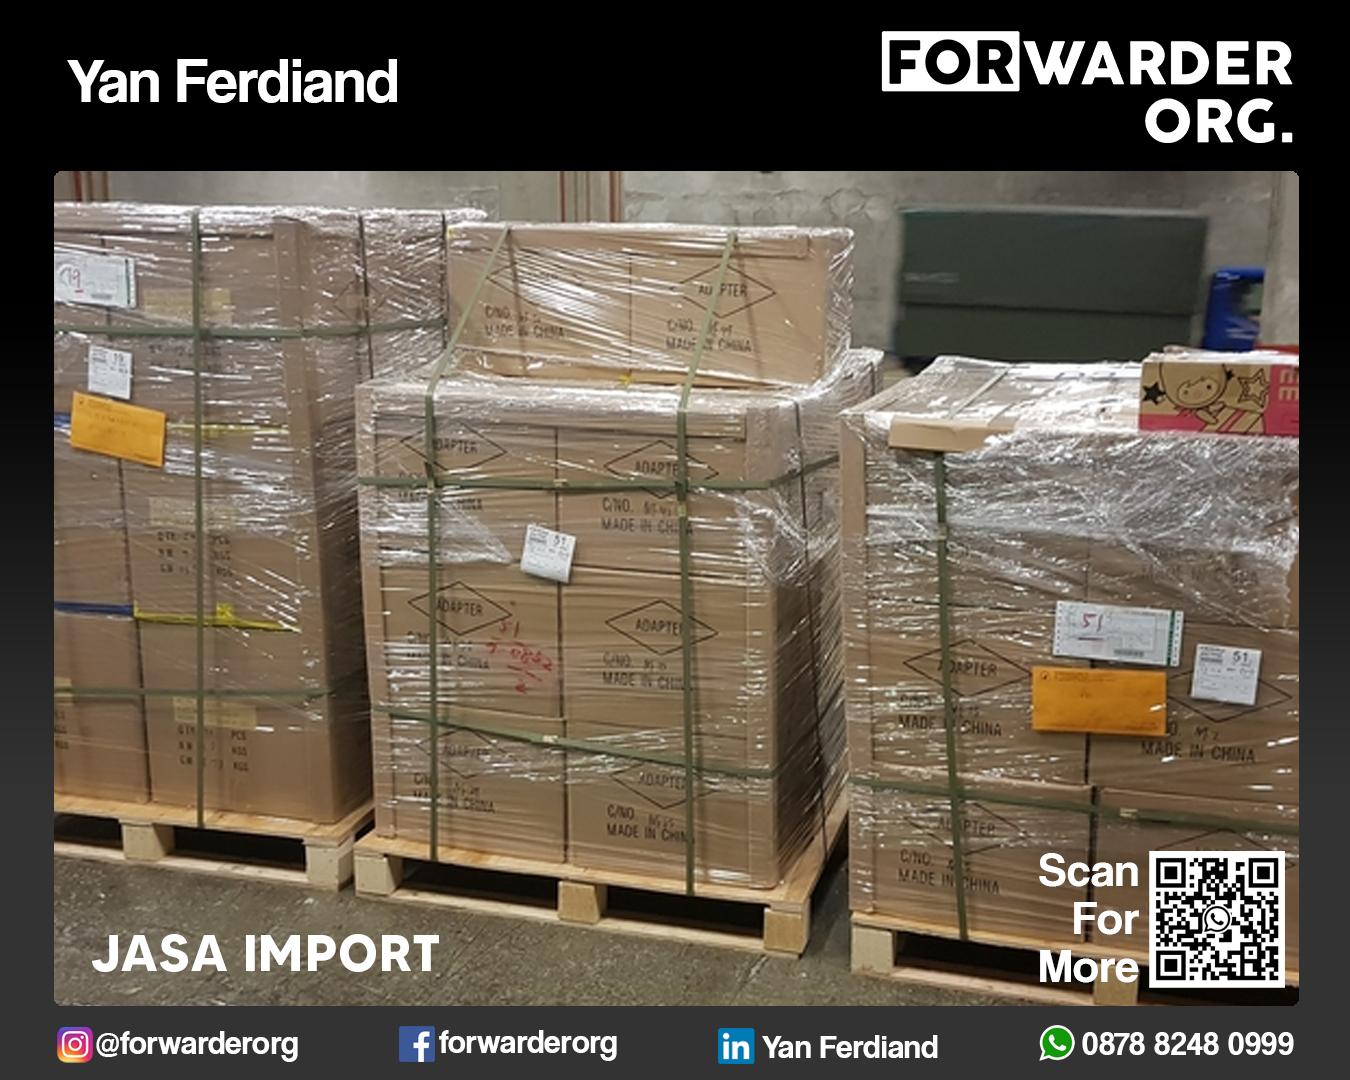 Jasa Import Sparepart Mesin Kapal LCL dan FCL | FORWARDER ORG